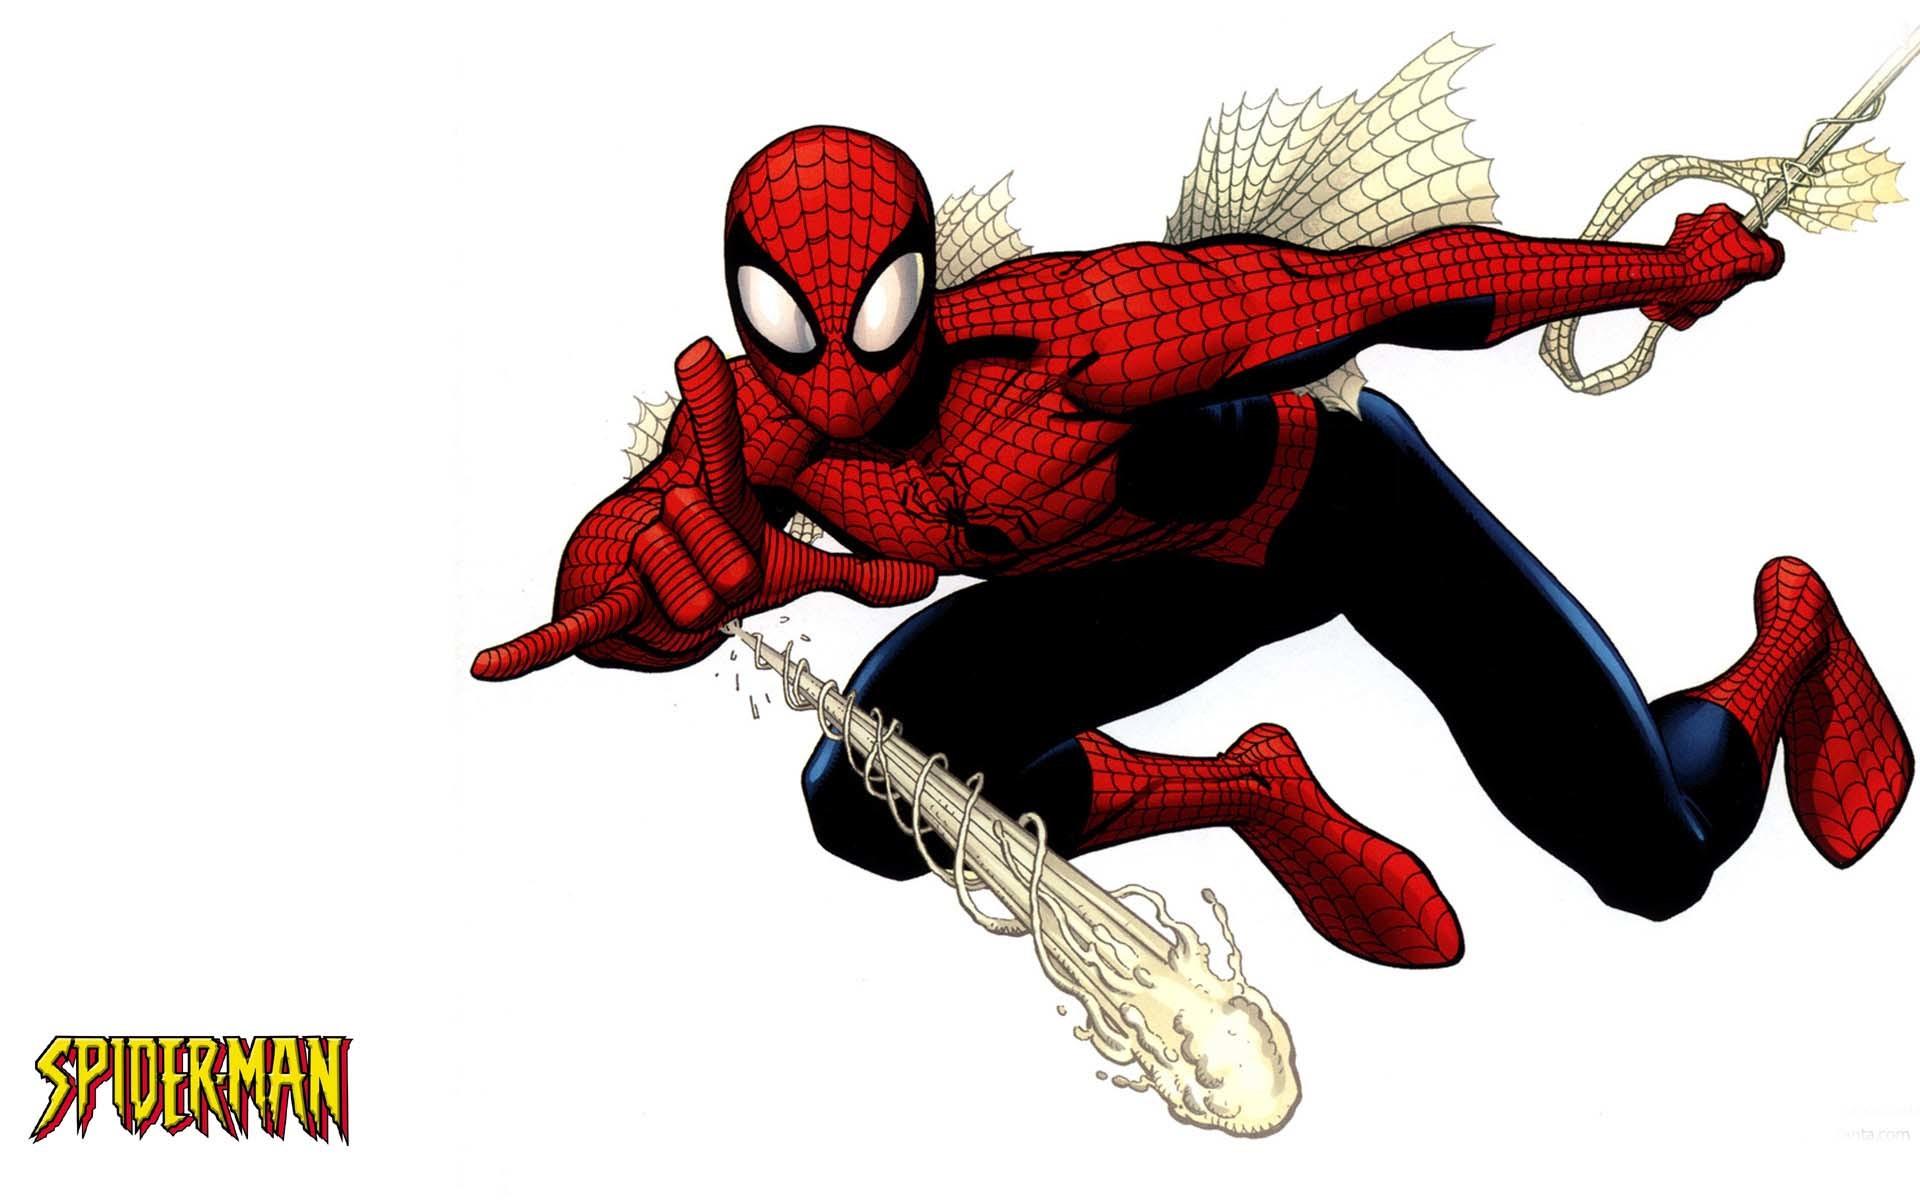 Spiderman Cartoon HD Wallpaper | HD Wallpapers Free Download